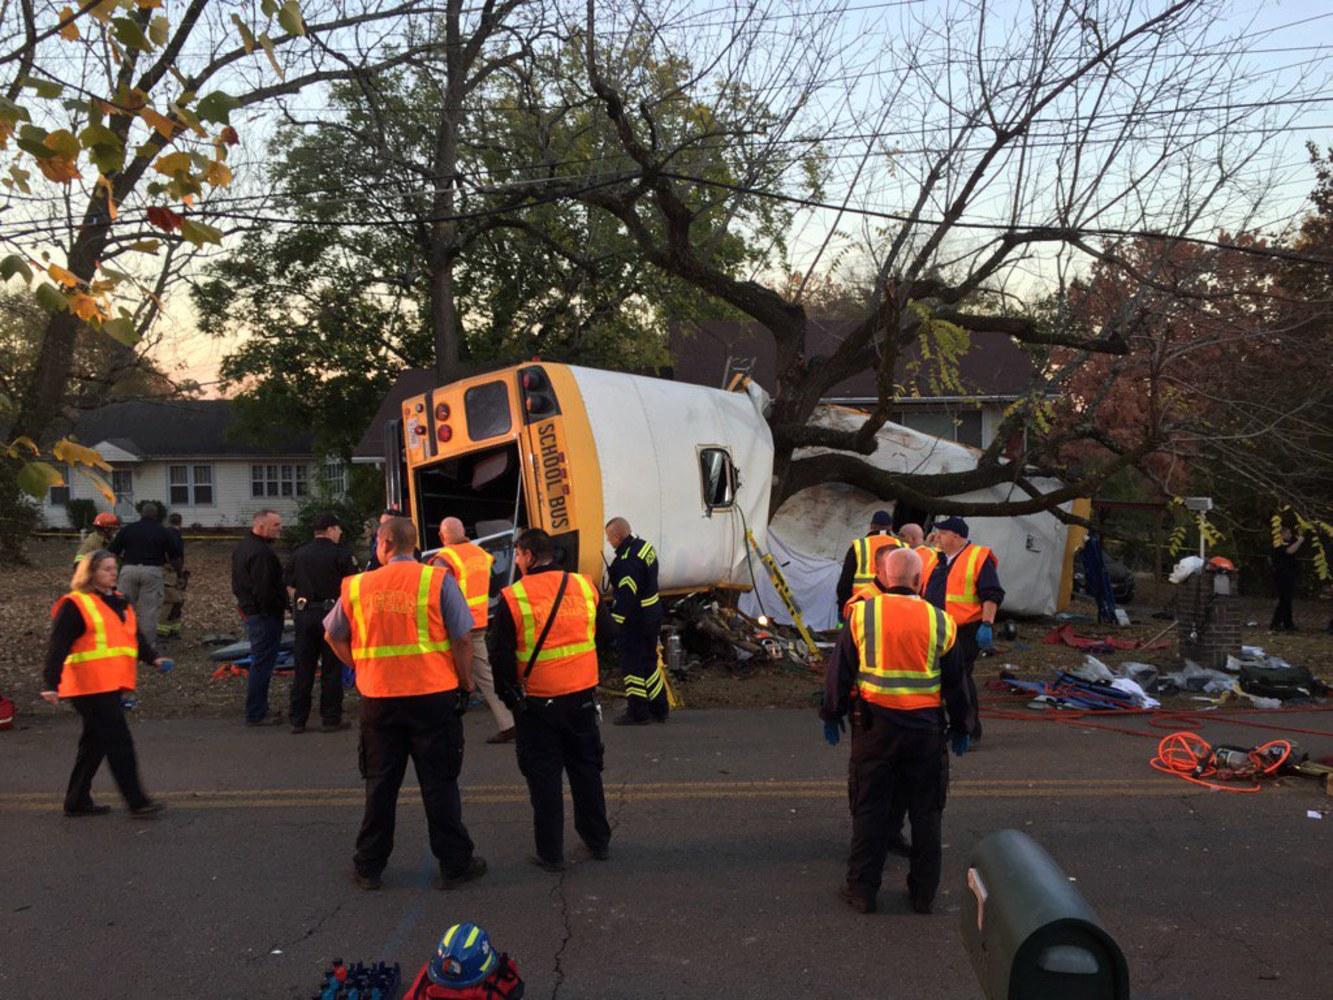 Bus driver speeding before crash